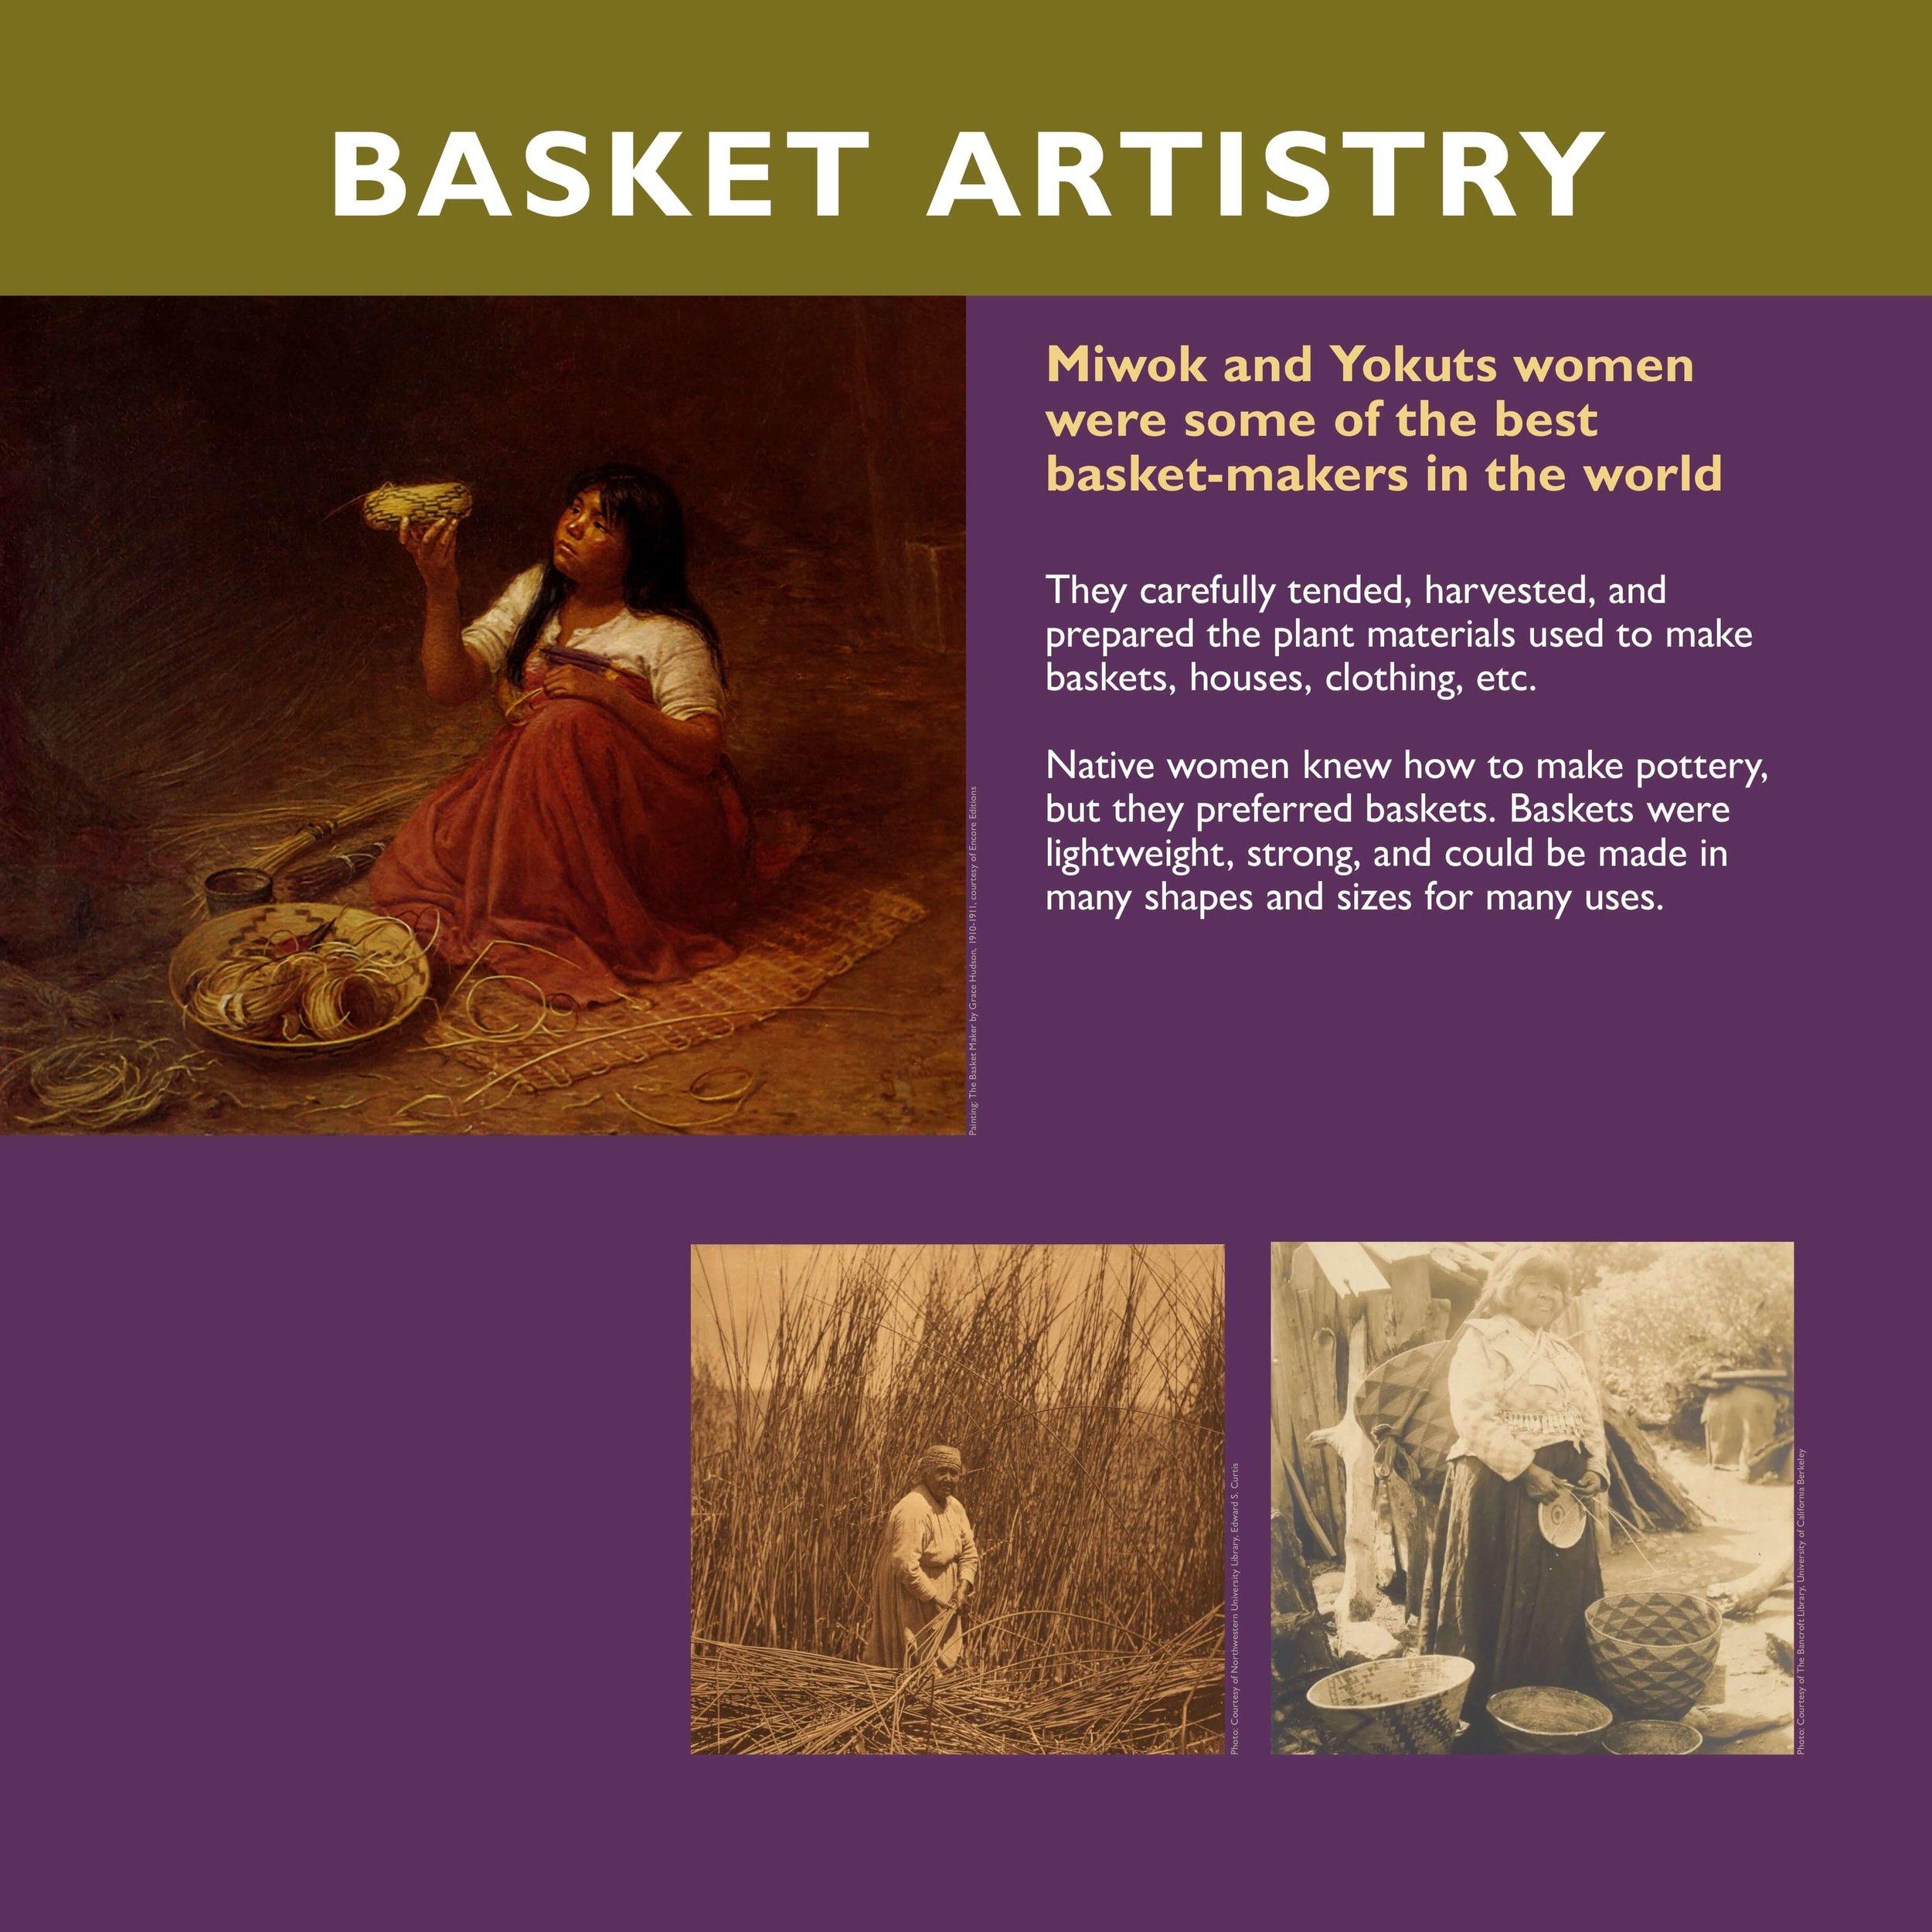 12-San Joaquin County-Historical Museum-The Sibbett Group-Basket Artistry.jpg